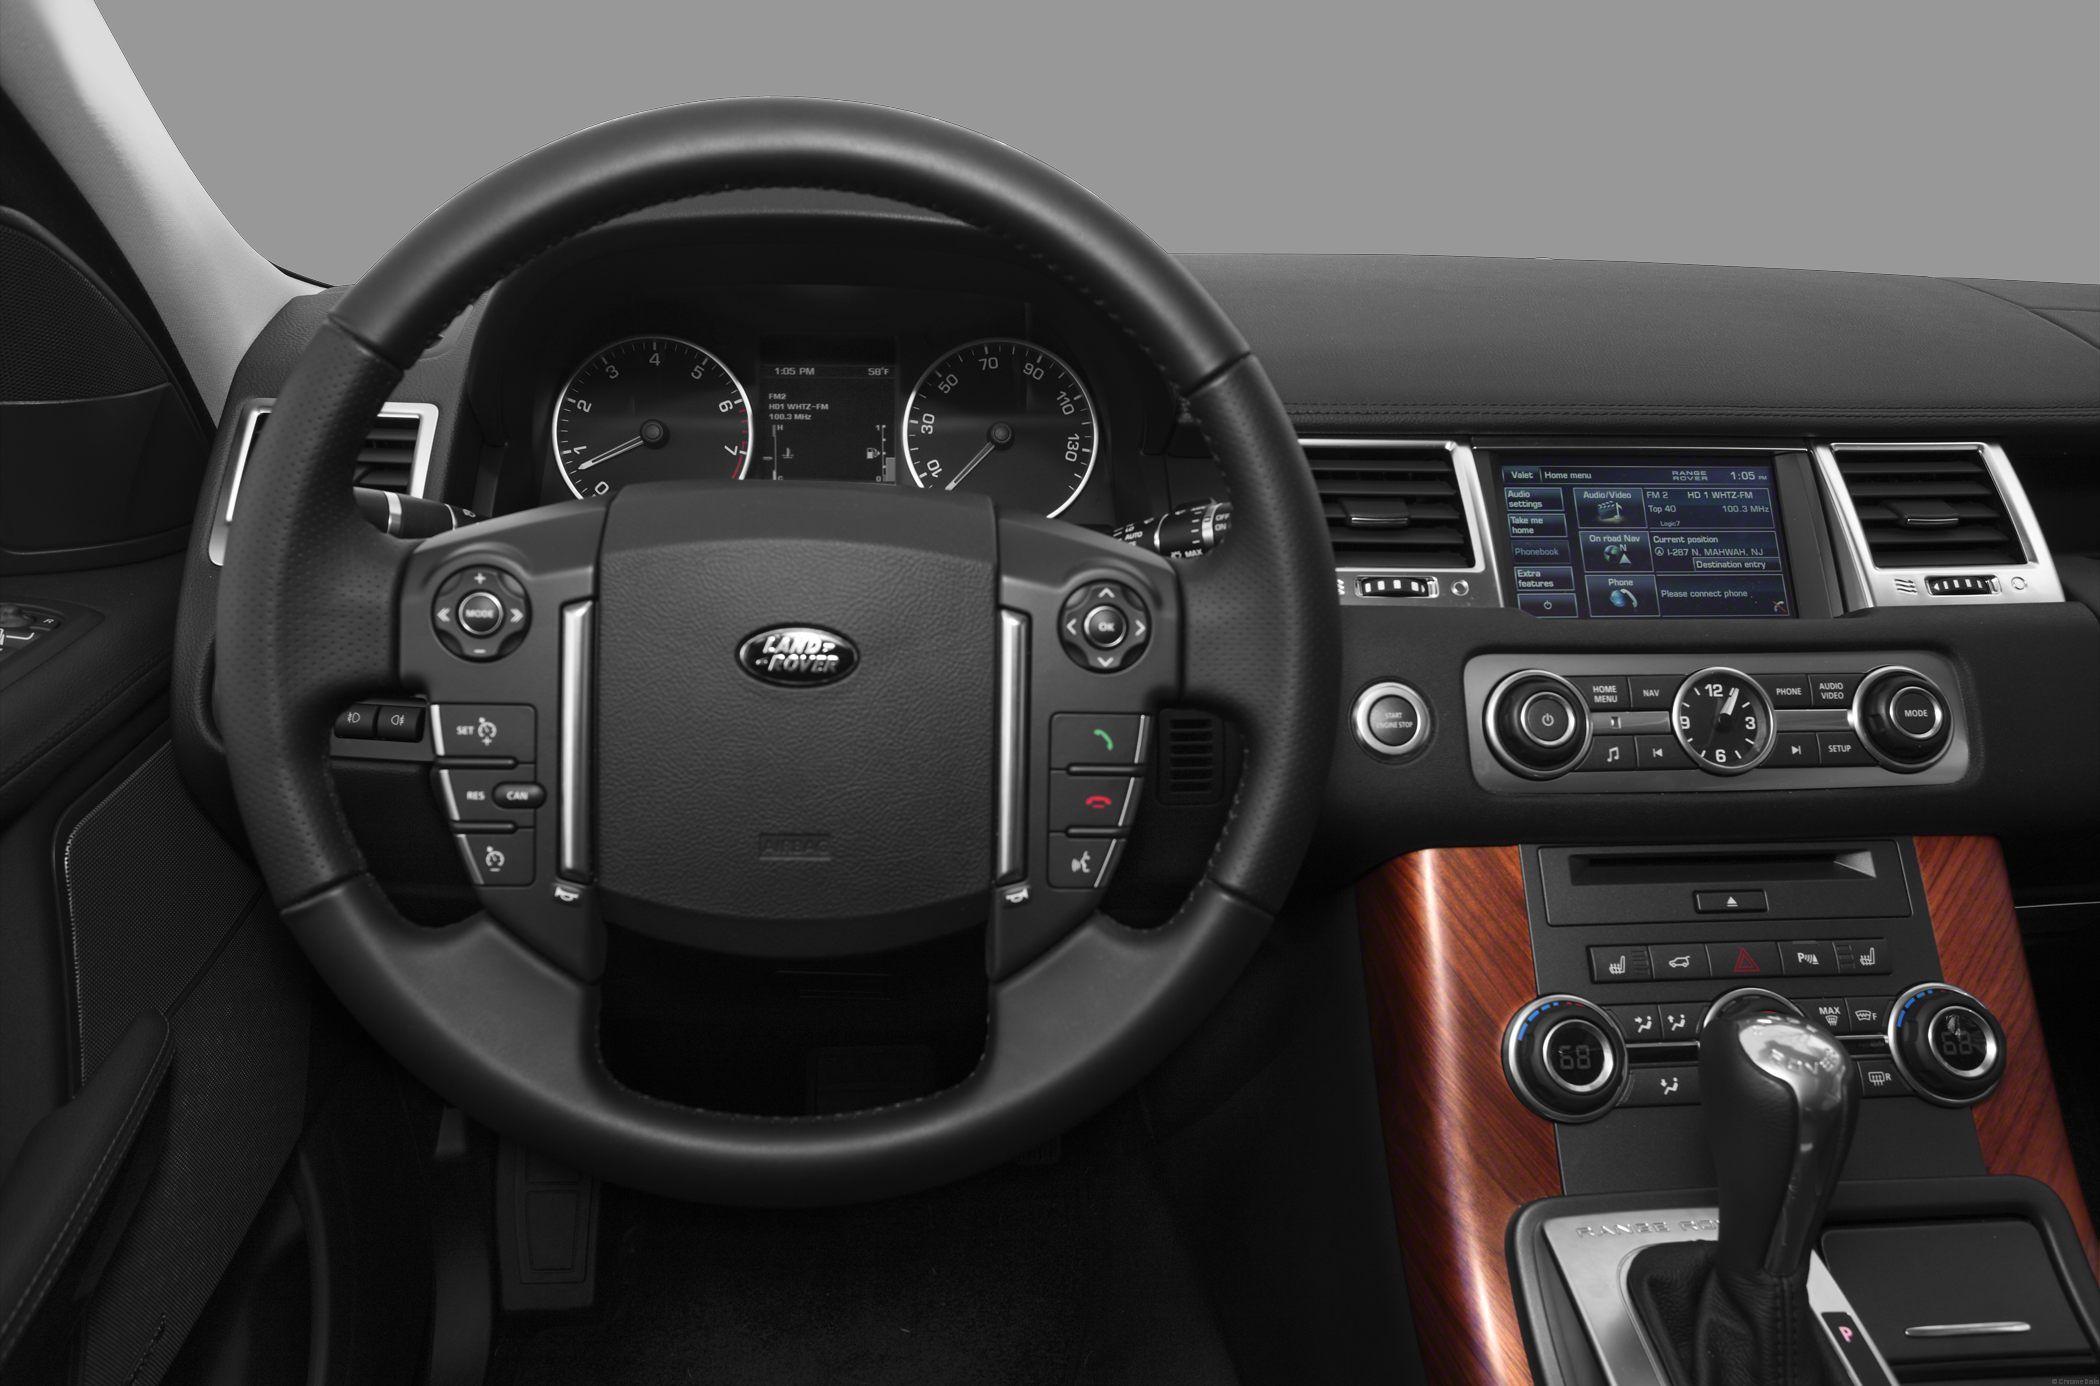 2013 Range Rover Interior sport   2013 Land Rover Range ...  Range